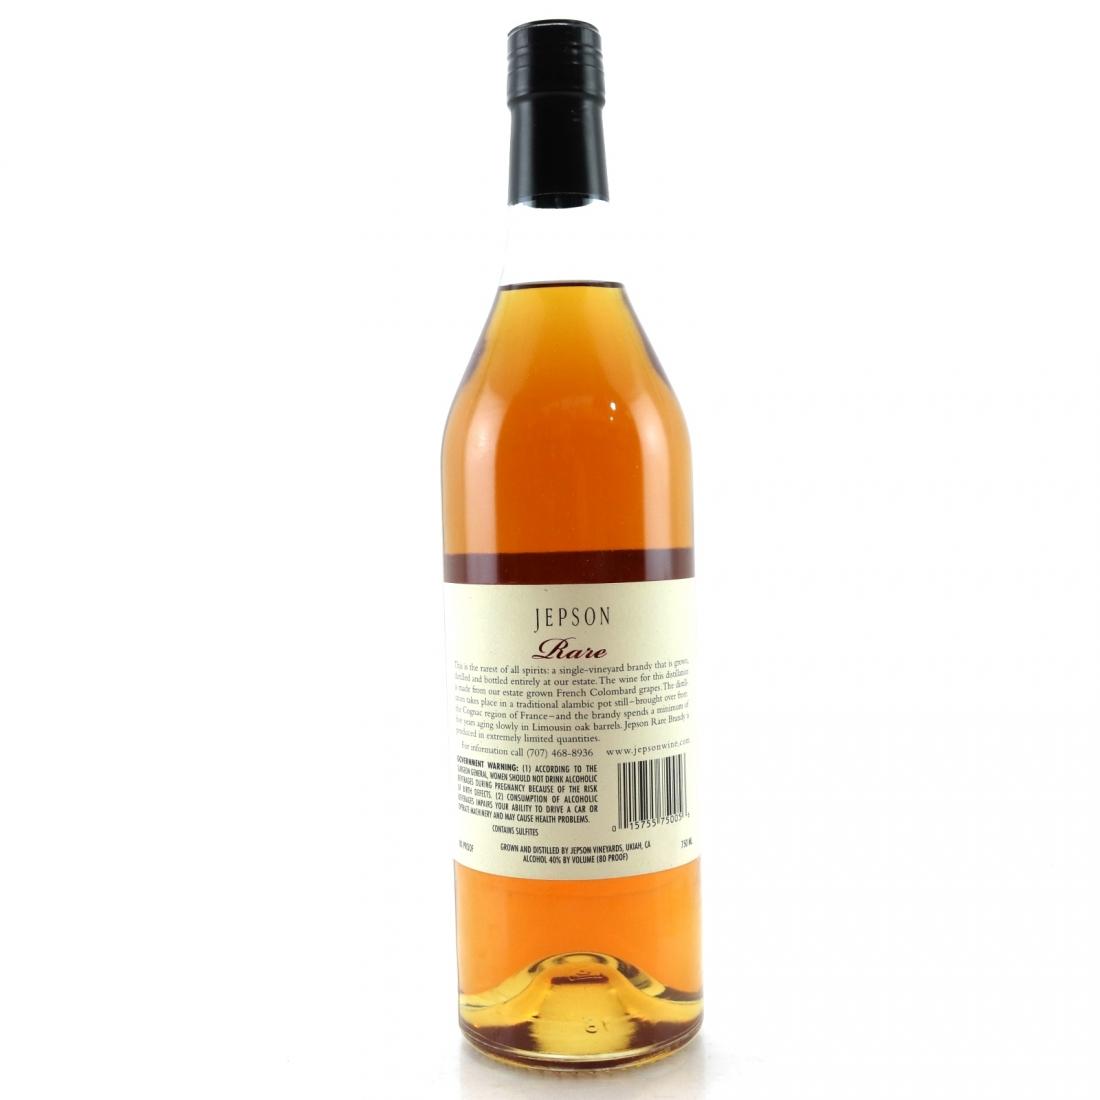 Jepson Rare Mendocino Alambic Brandy / 75cl US Import